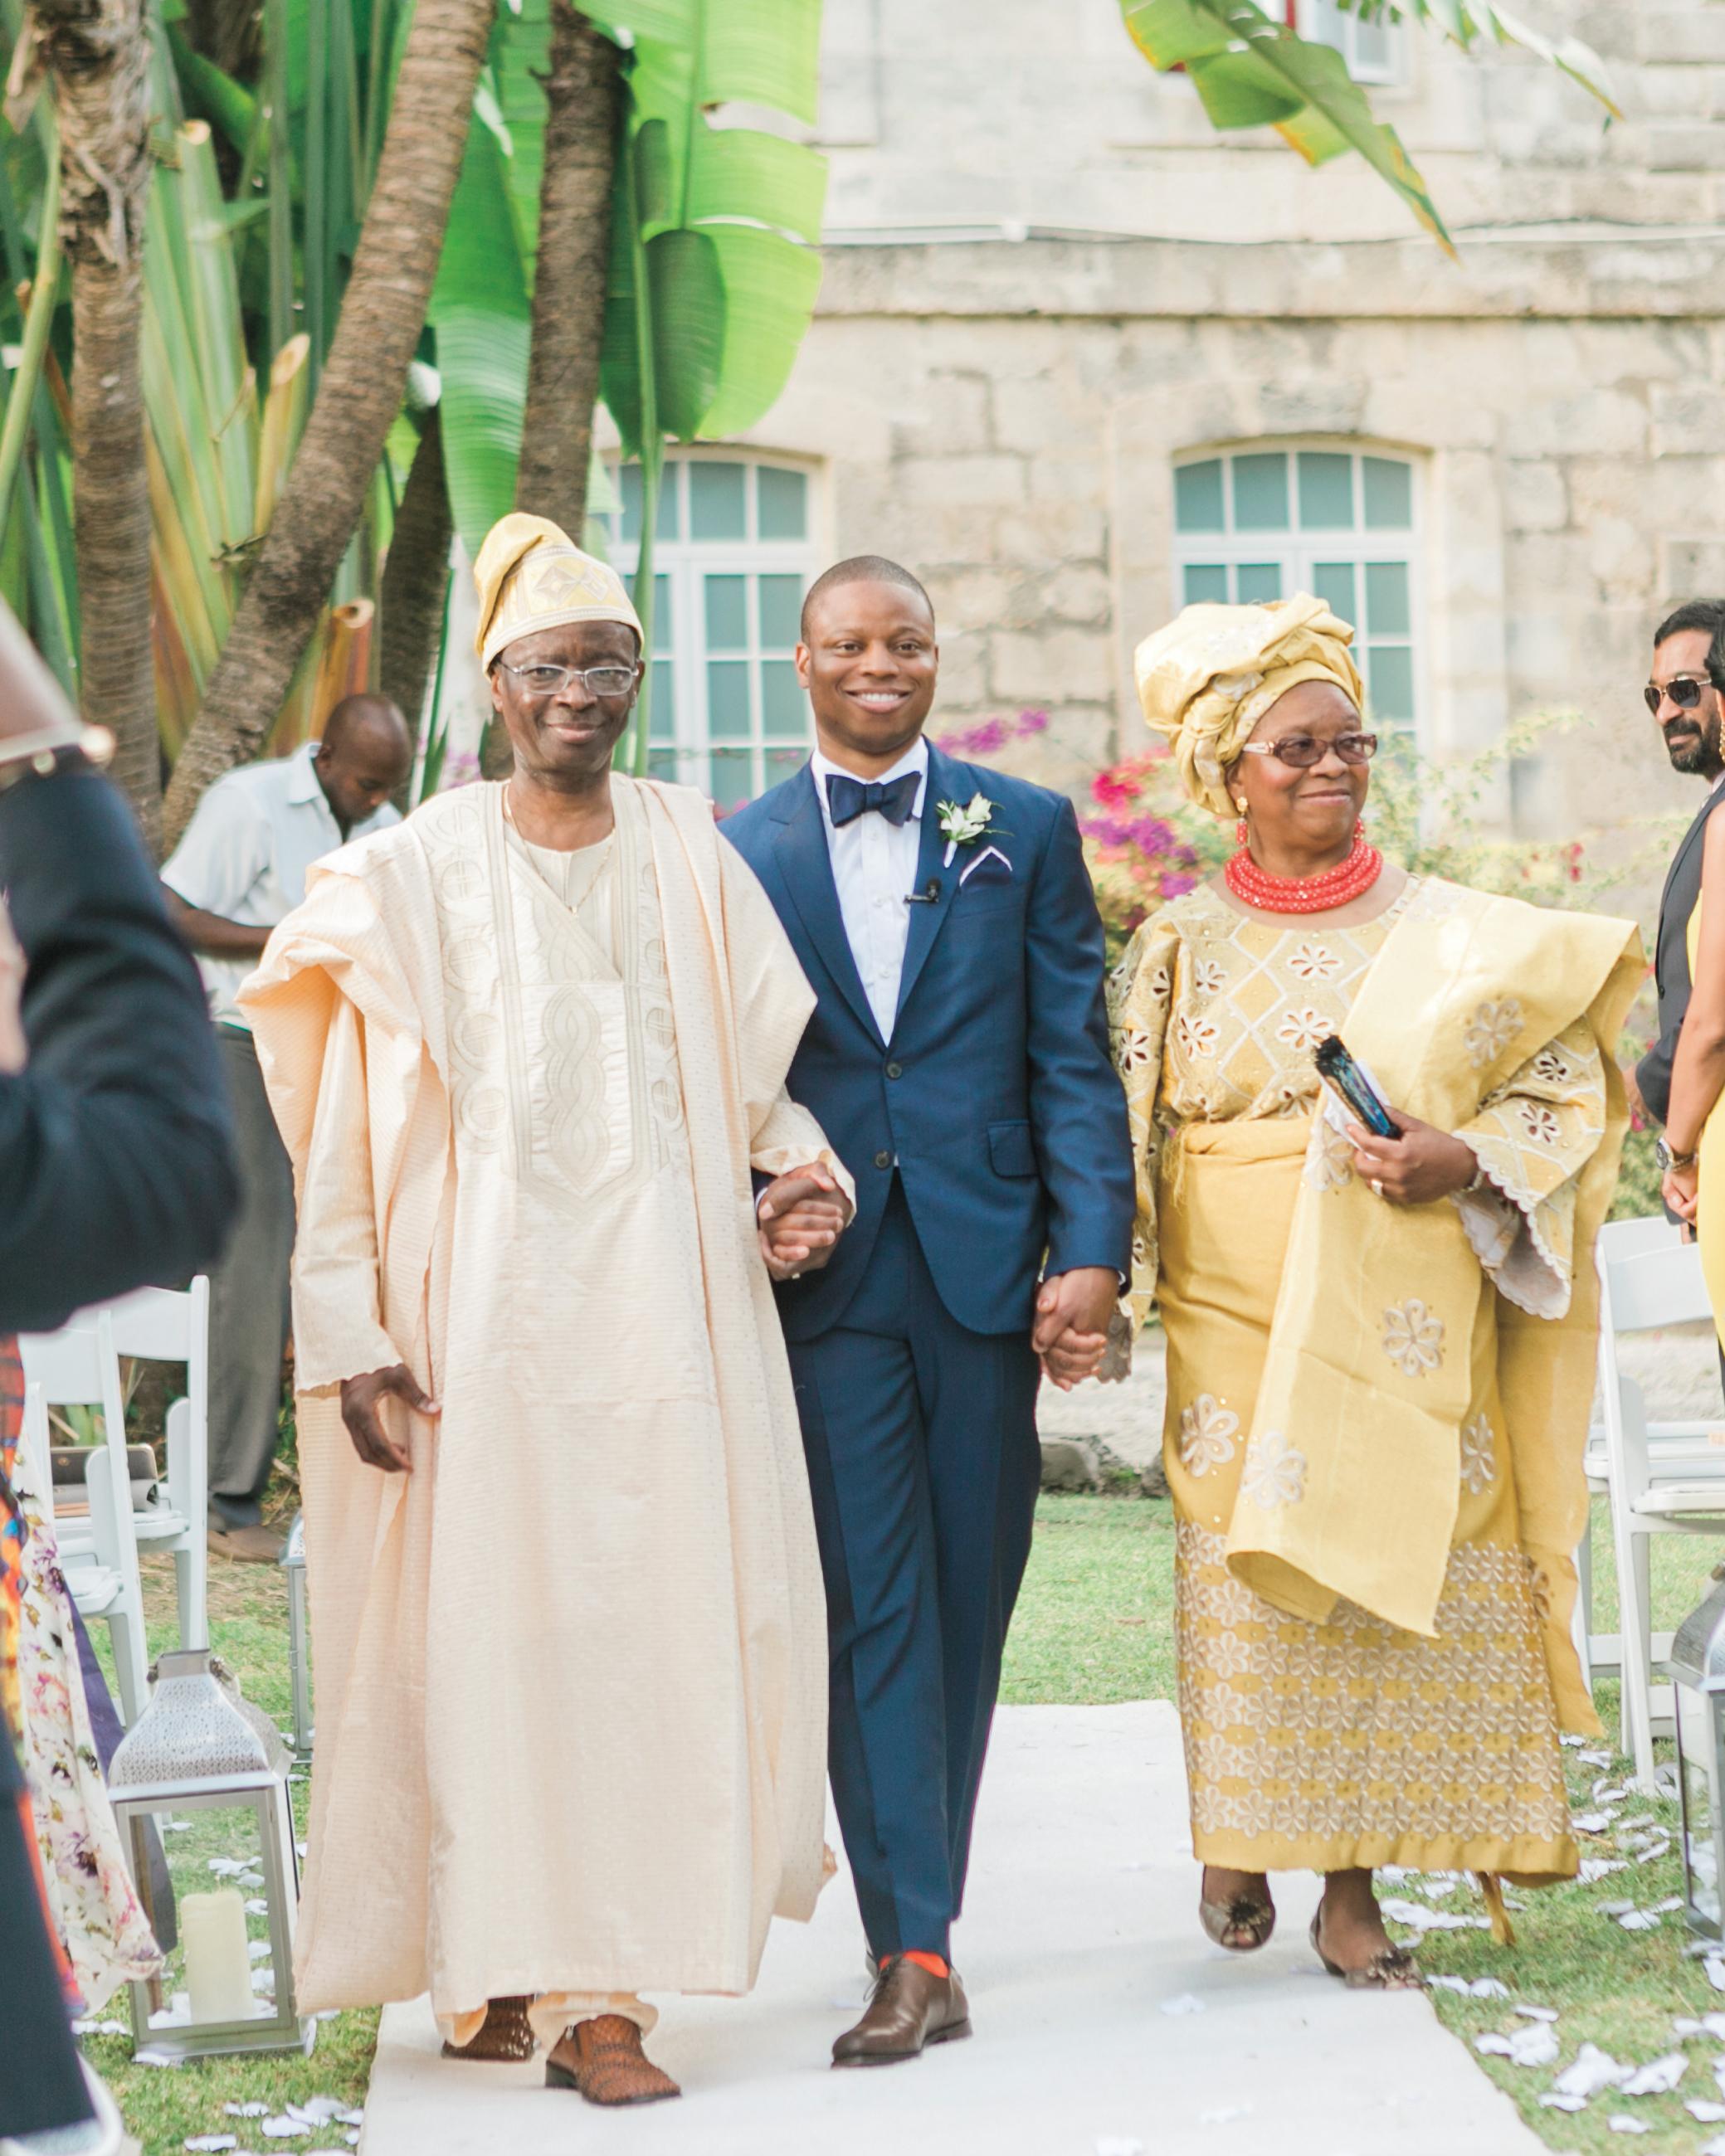 akua-folu-wedding-barbados-021-s112444.jpg